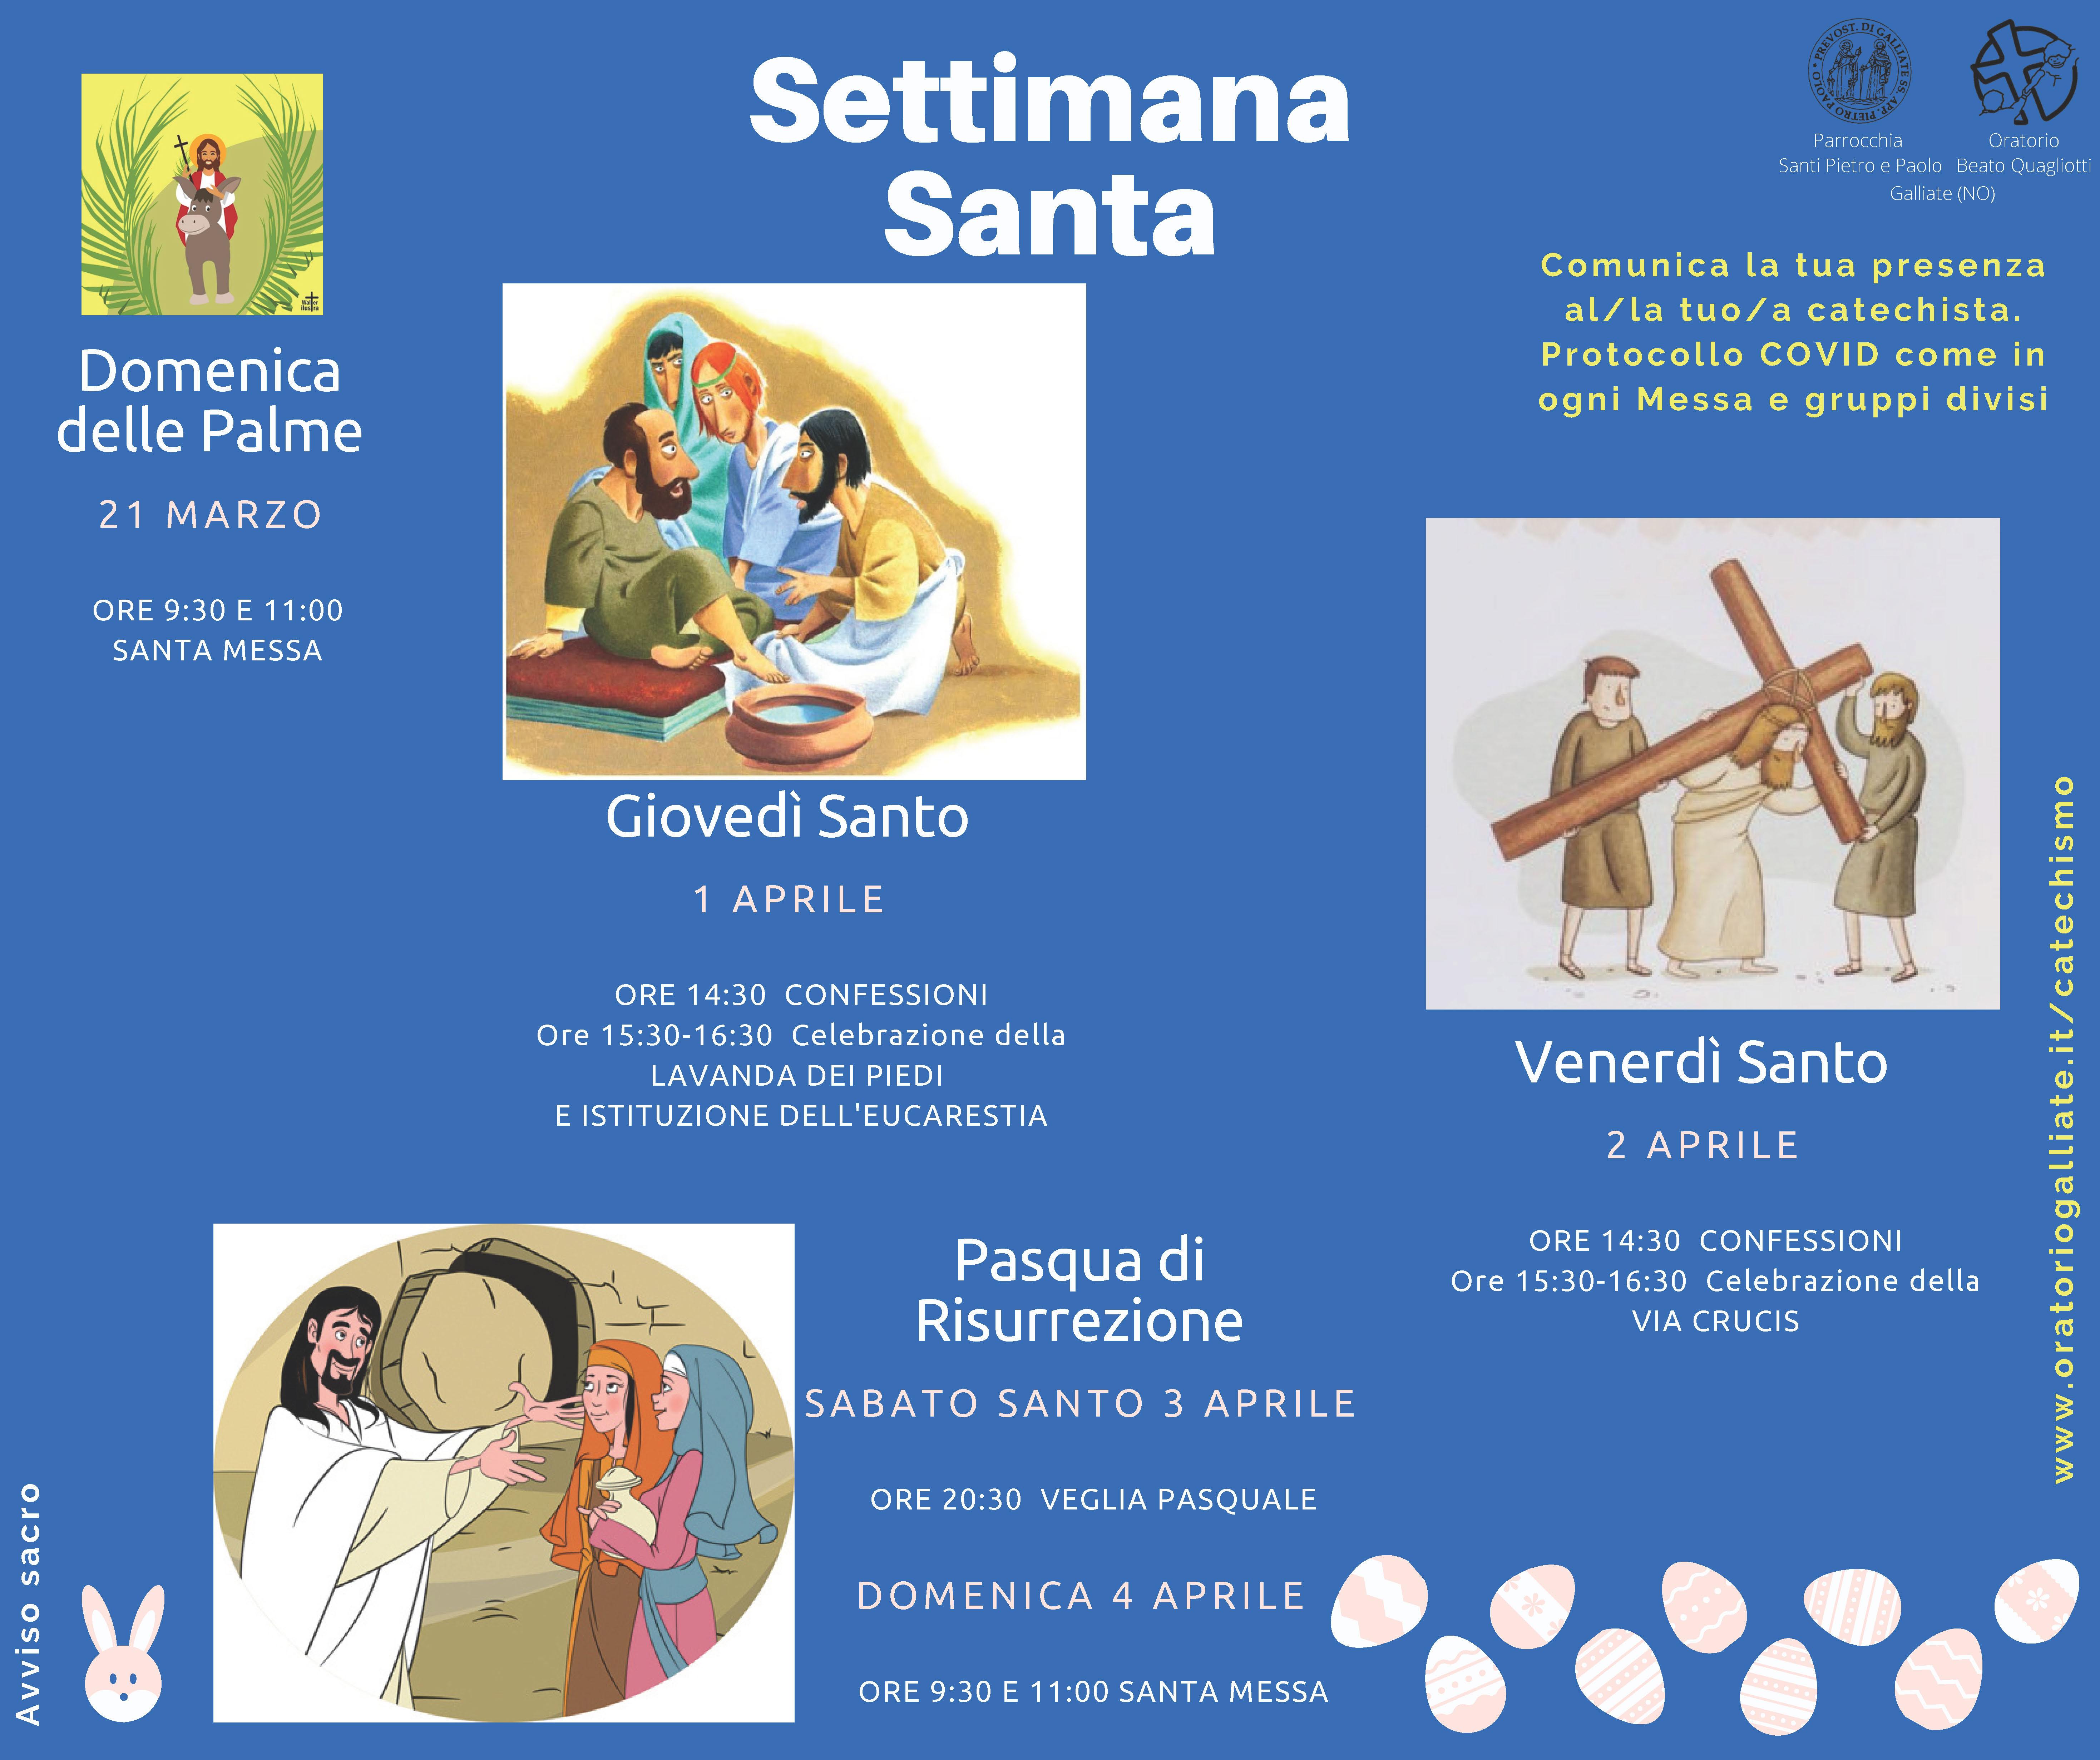 bp210328-SettimanaSanta_BambiniRagazzi_Catechismo